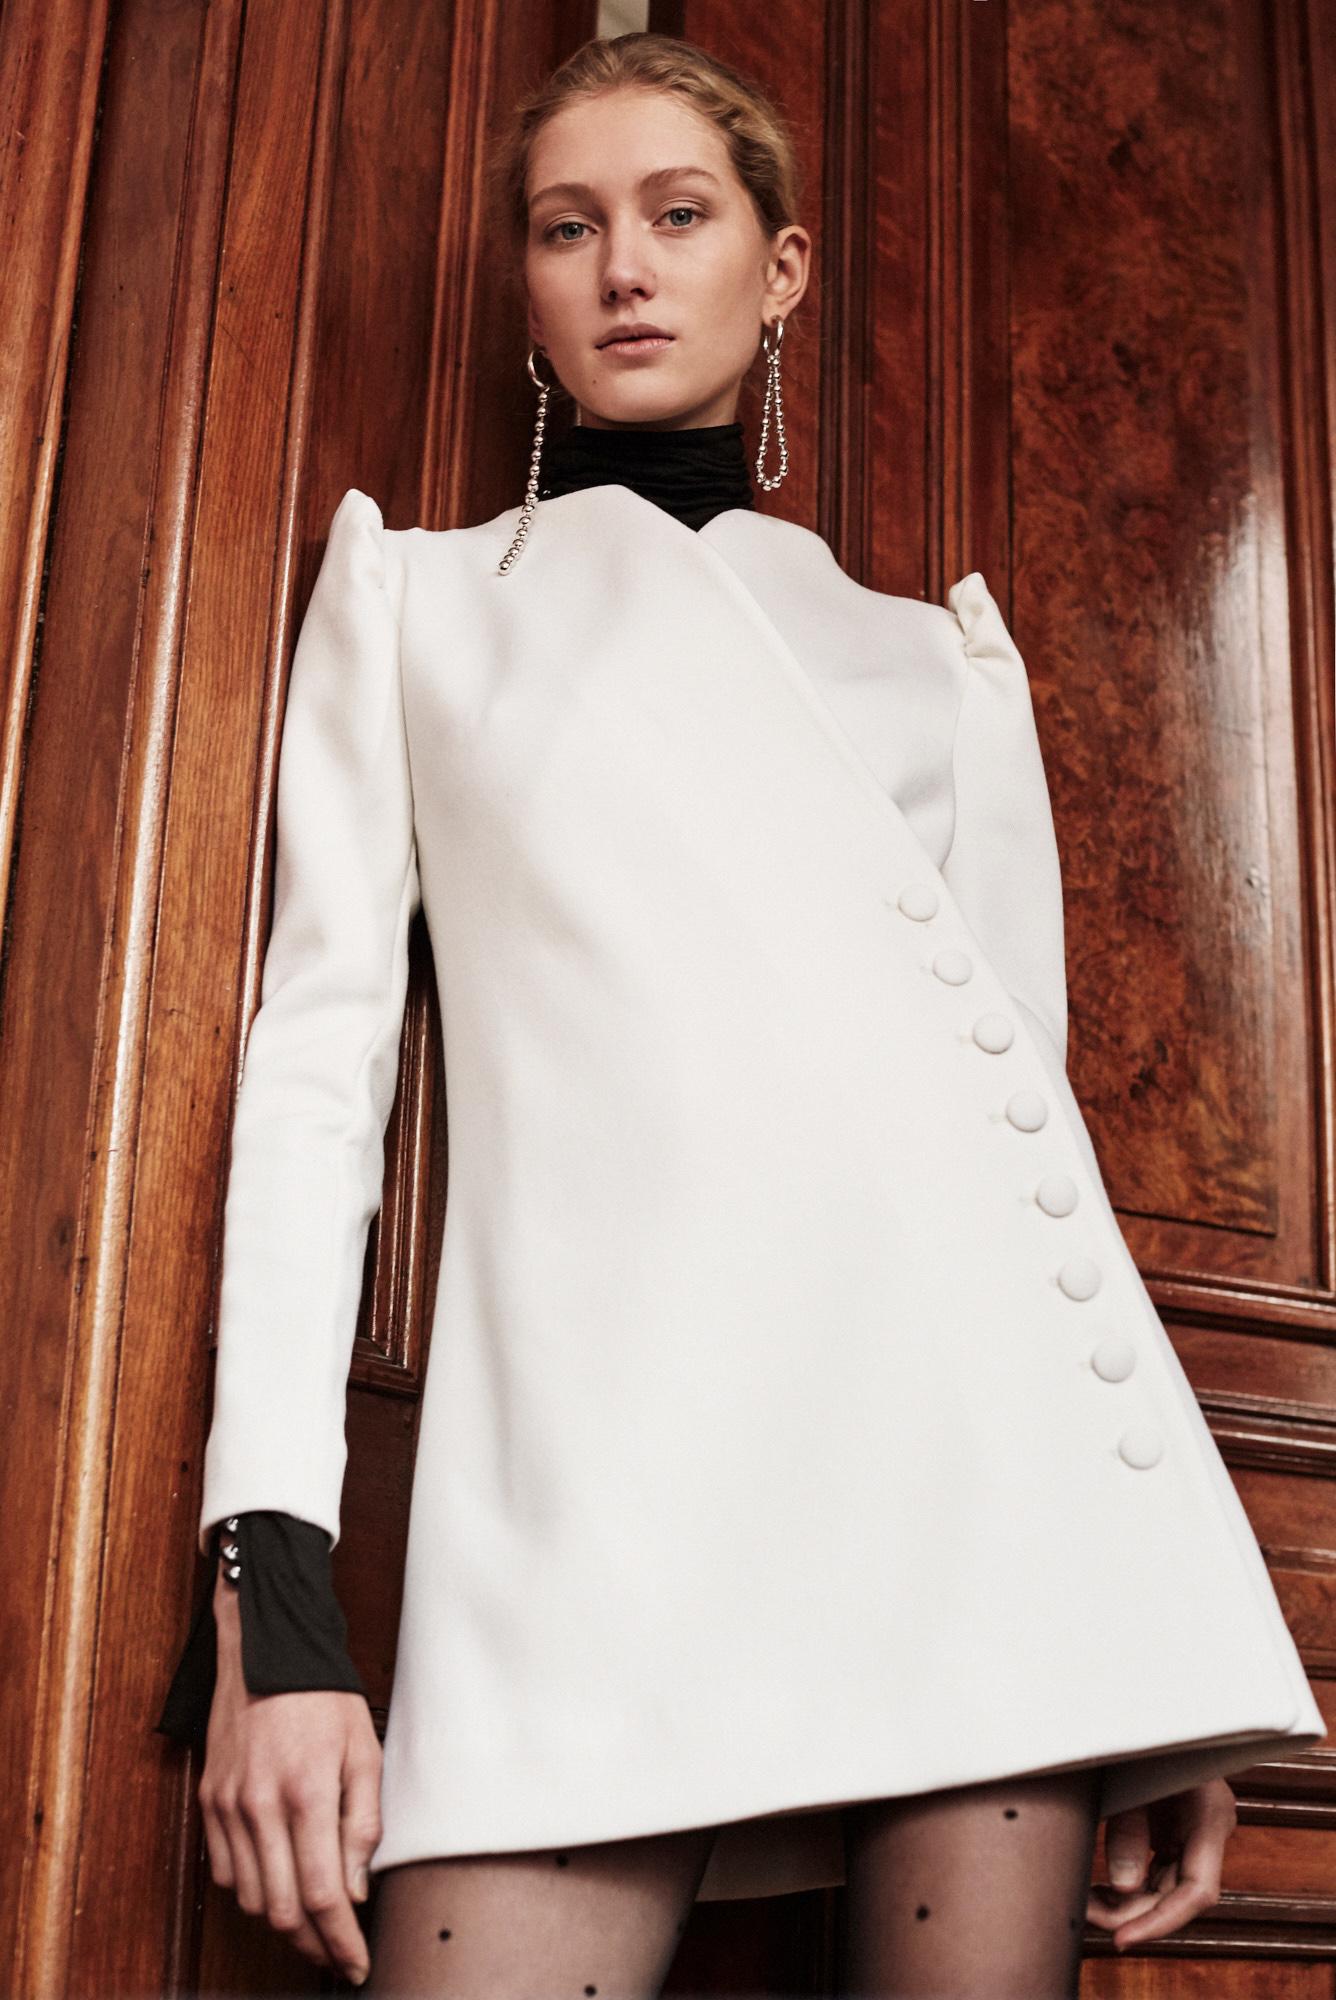 Lein wedding dress spring 2019 long sleeve high neck jacket with black collar